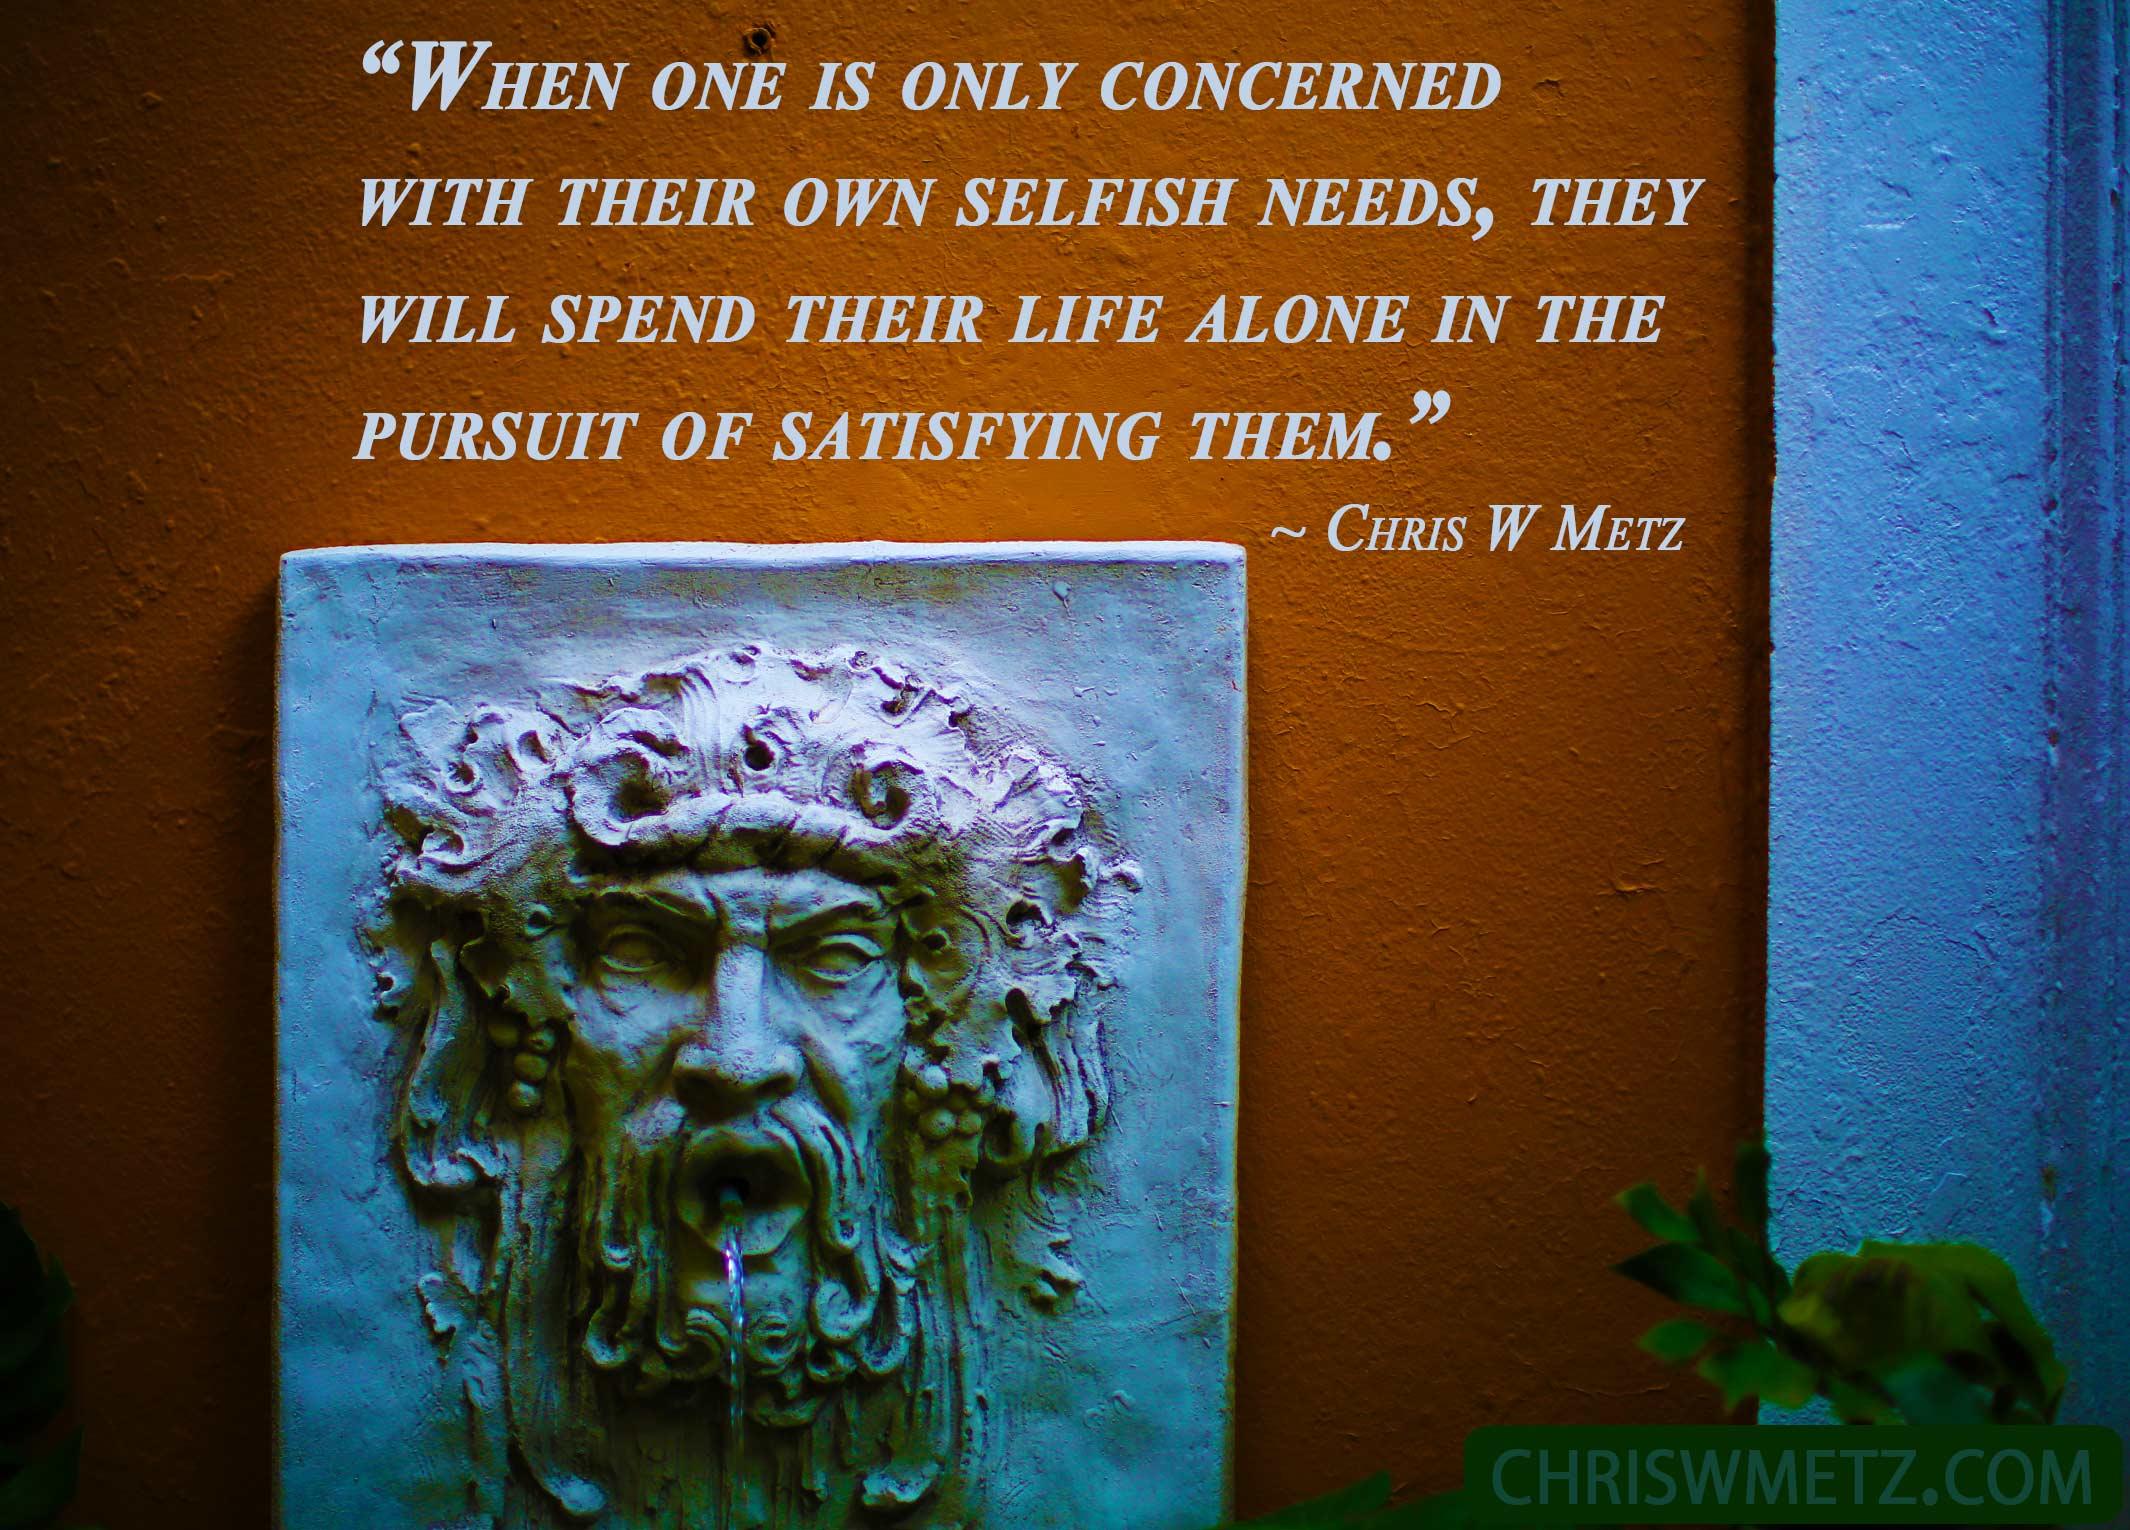 Chris W Metz